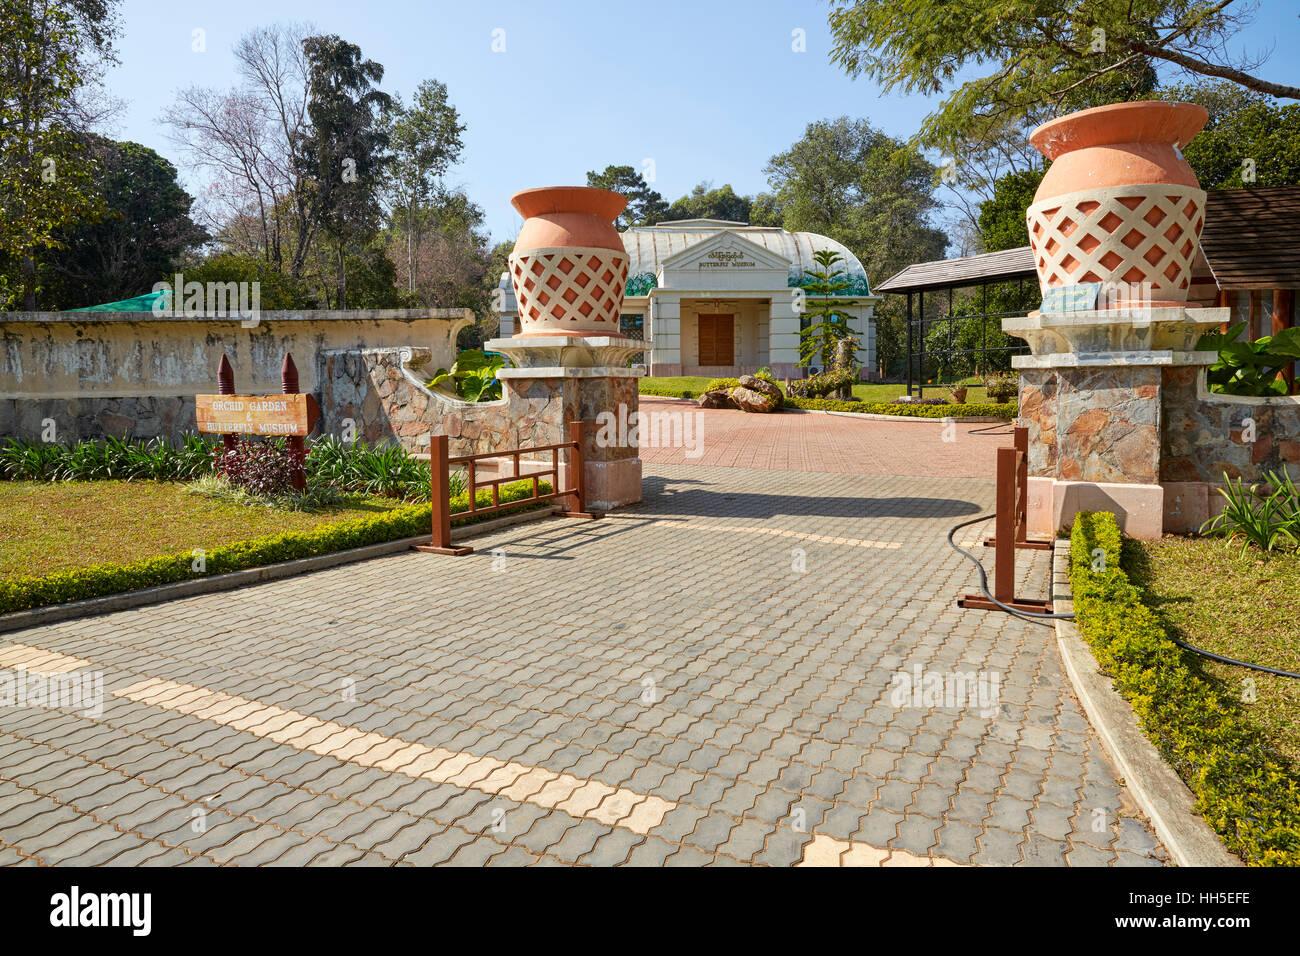 Orchid Garden And Butterfly Museum, National Kandawgyi Botanical Gardens,  Pyin U Lwin, Pyin Oo Lwin (Maymyo), Myanmar